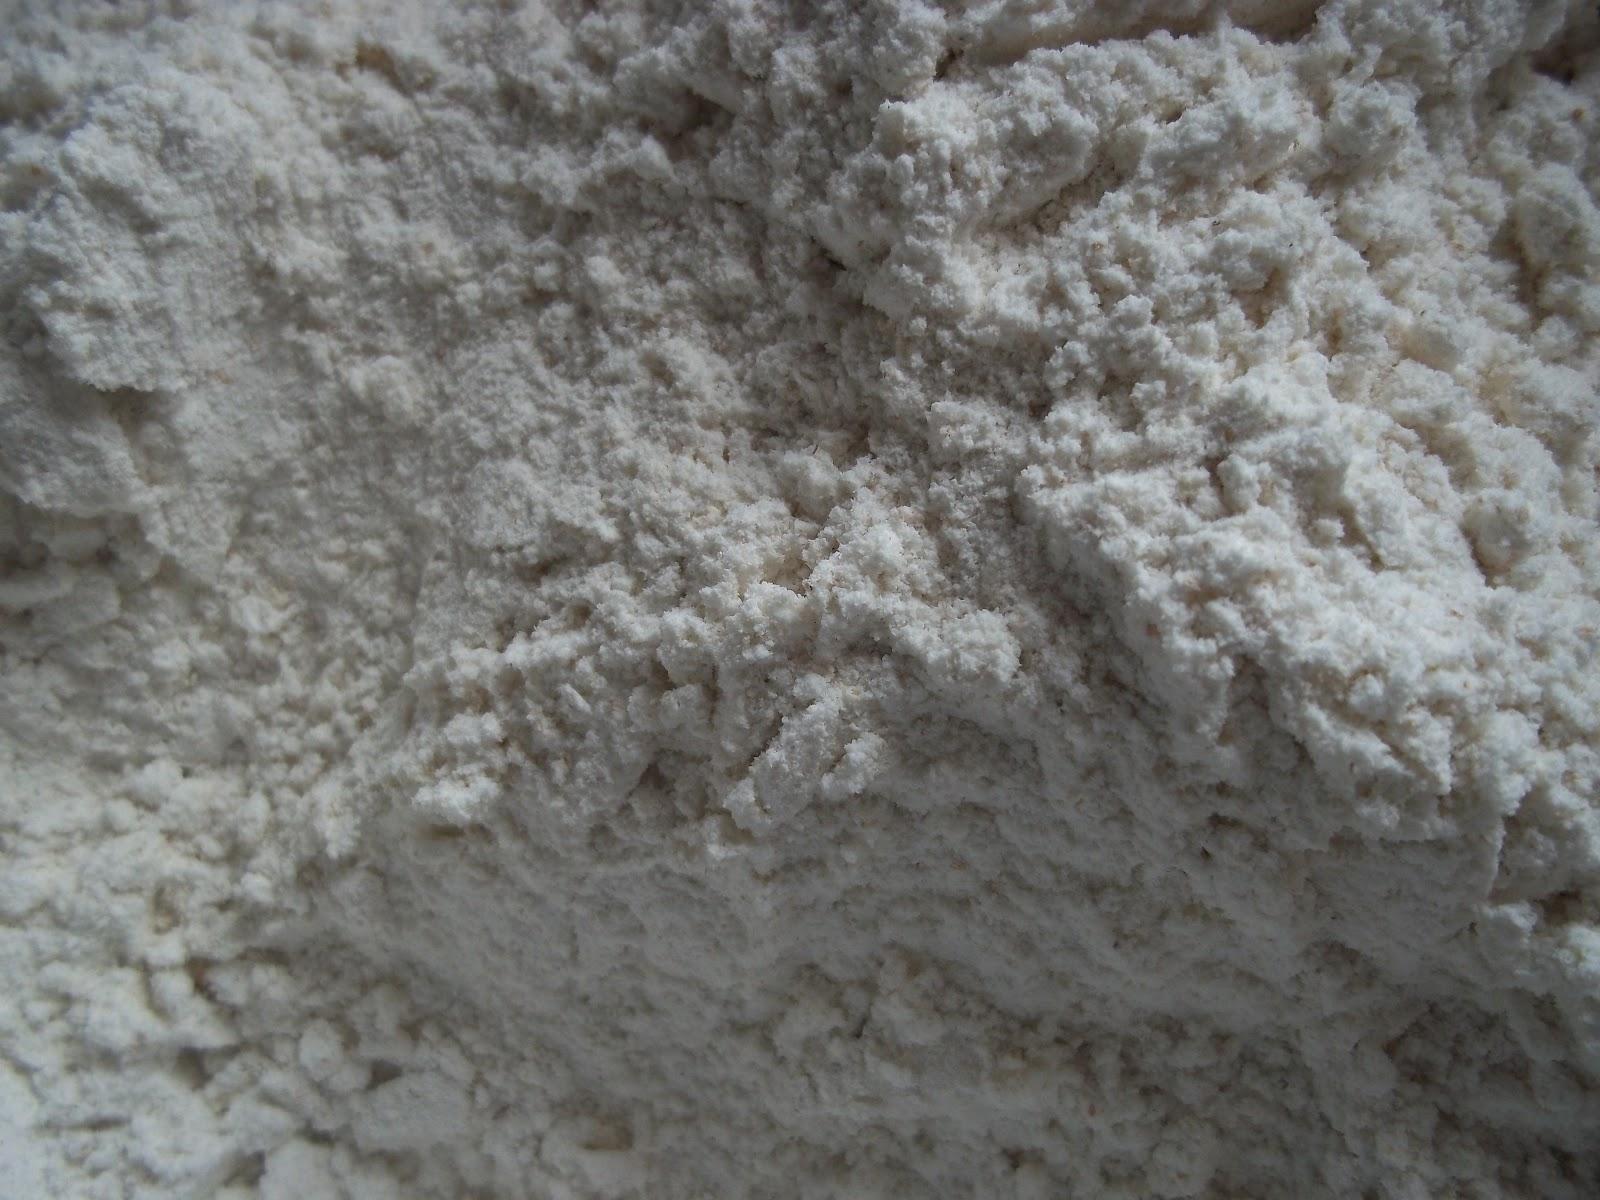 Homemade Gluten Free All Purpose Flour Mix Recipe